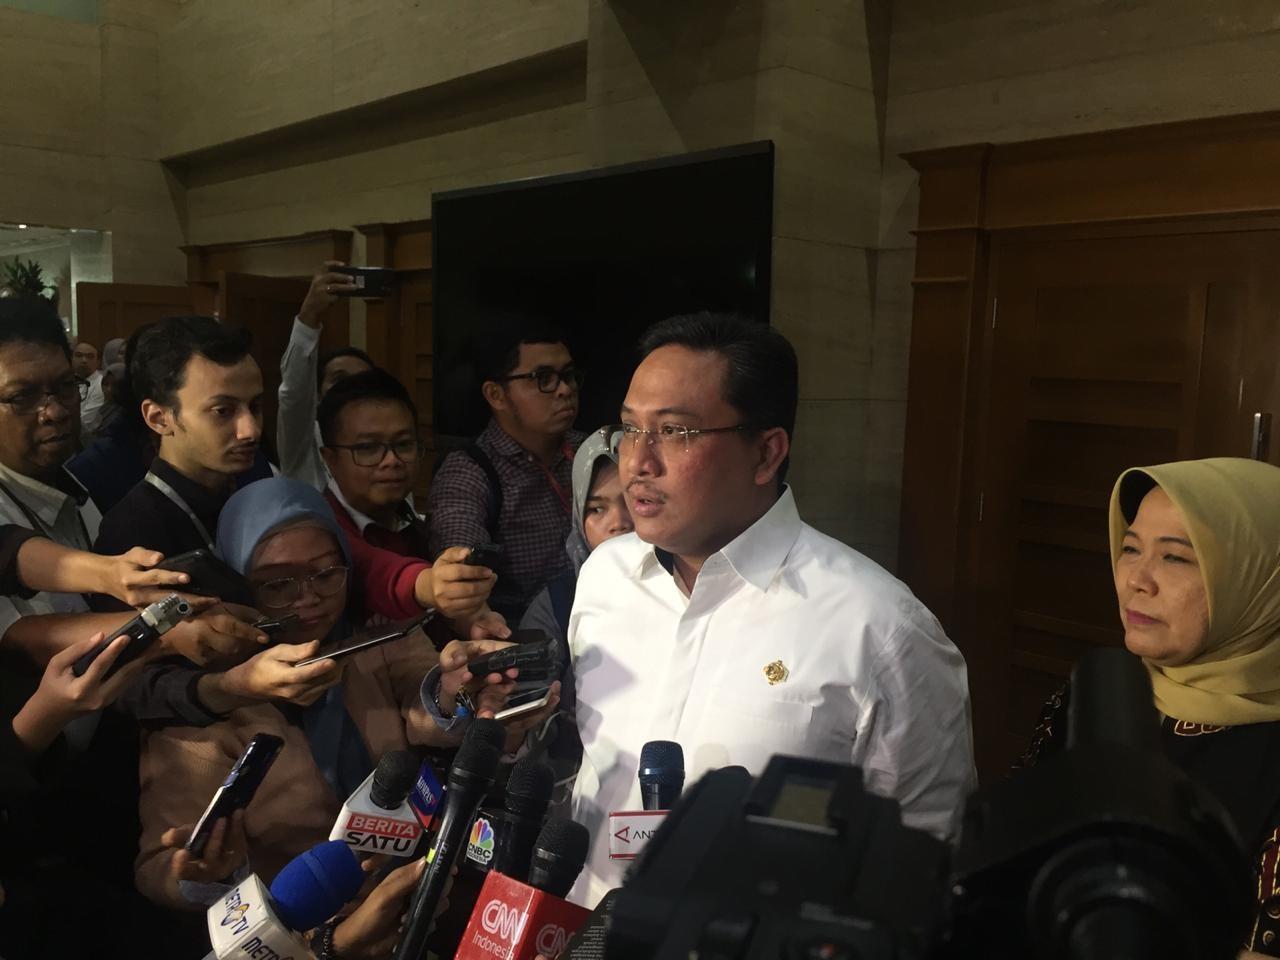 Government earns highest audit rating from BPK despite irregularities